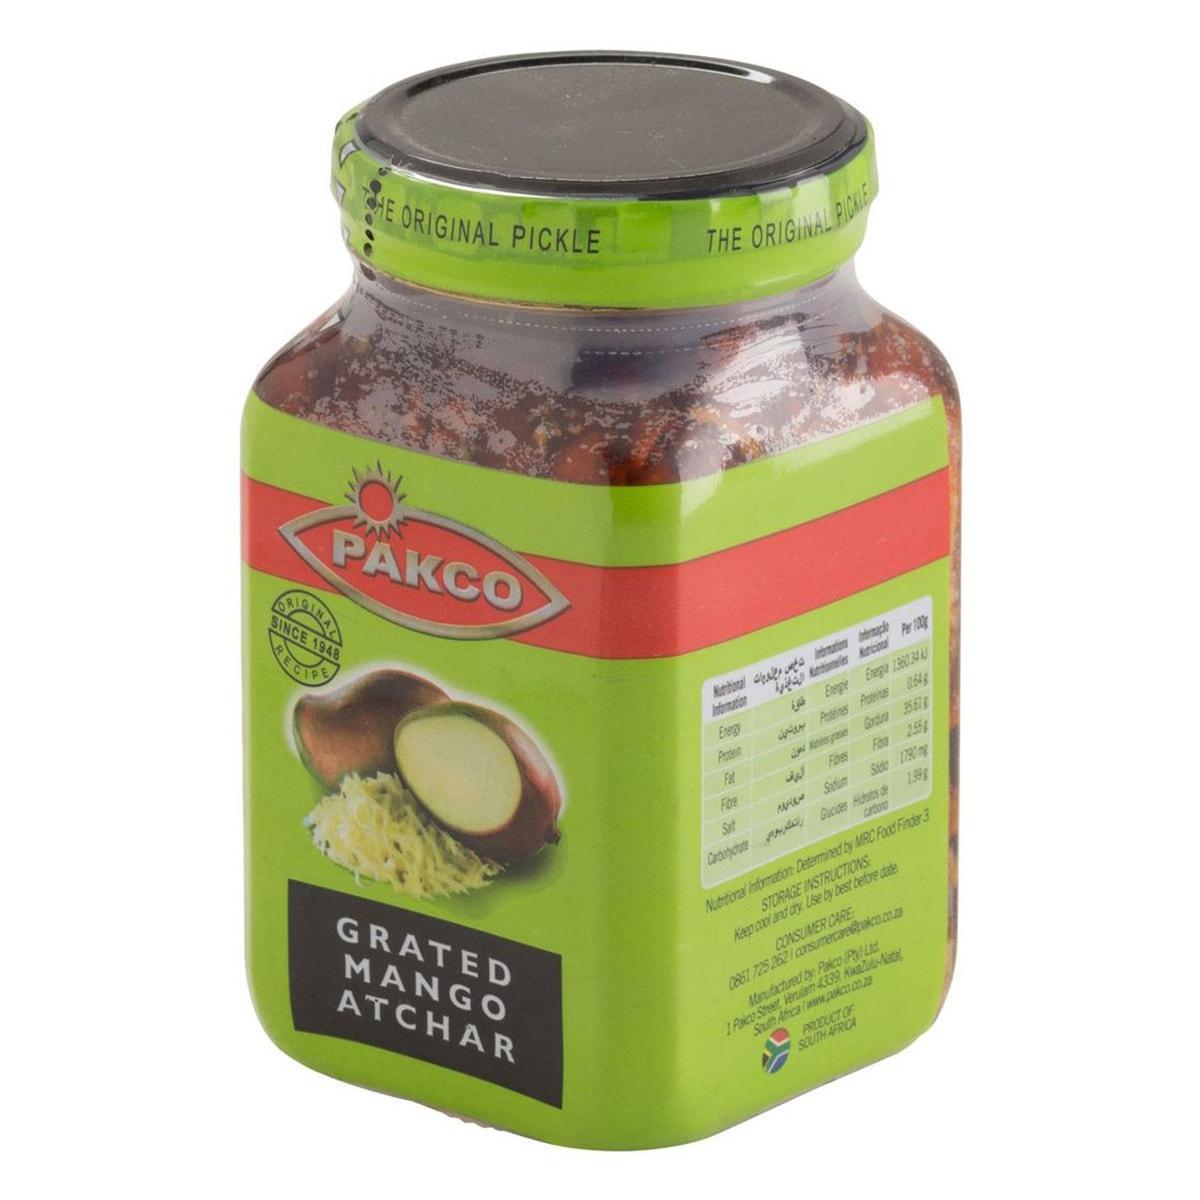 Buy Pakco Mango Atchar Grated - 400 gm